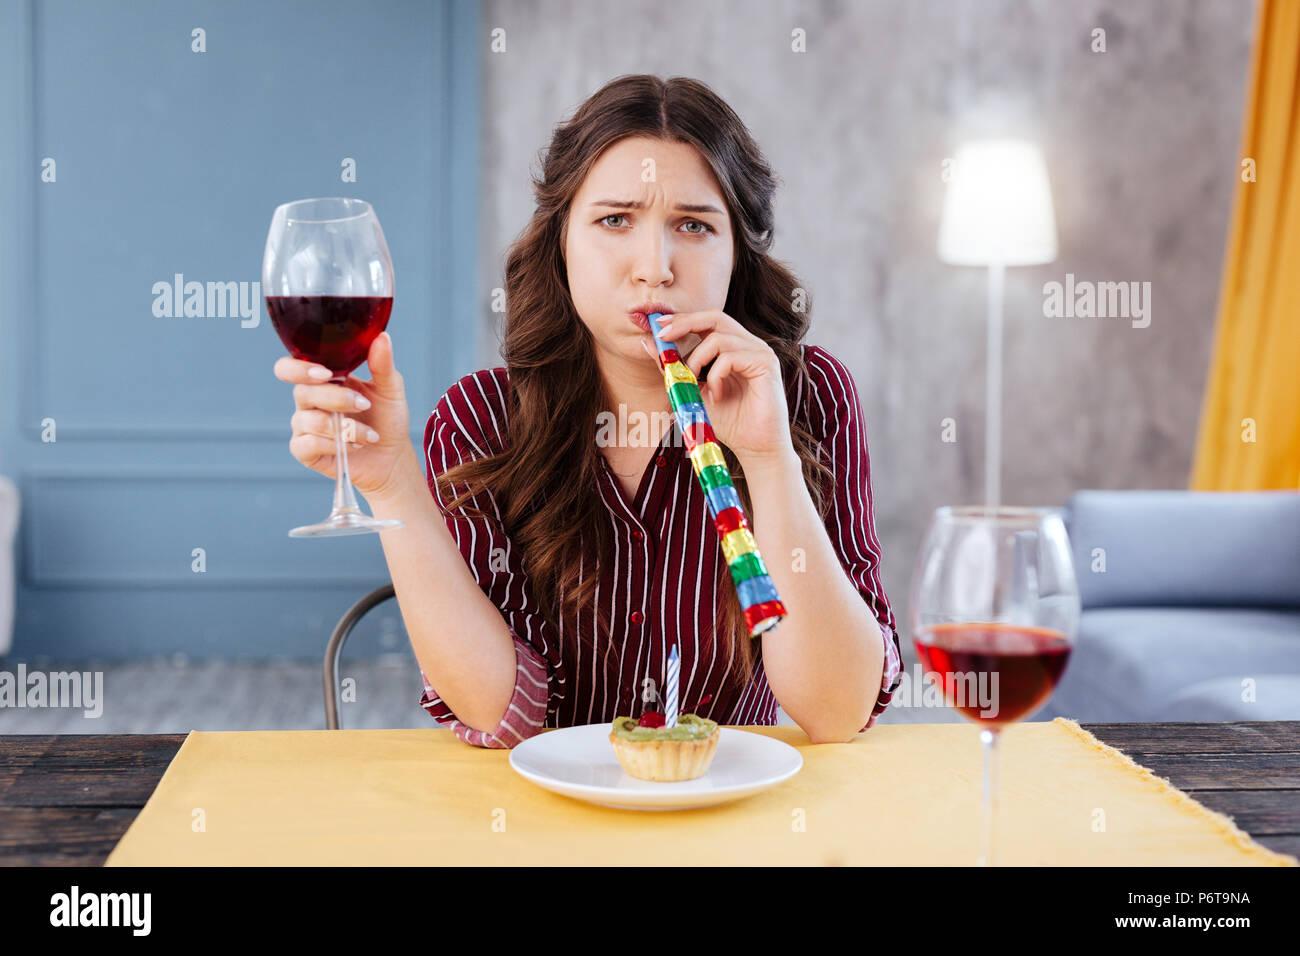 Blue-eyed girl feeling melancholic on her birthday - Stock Image